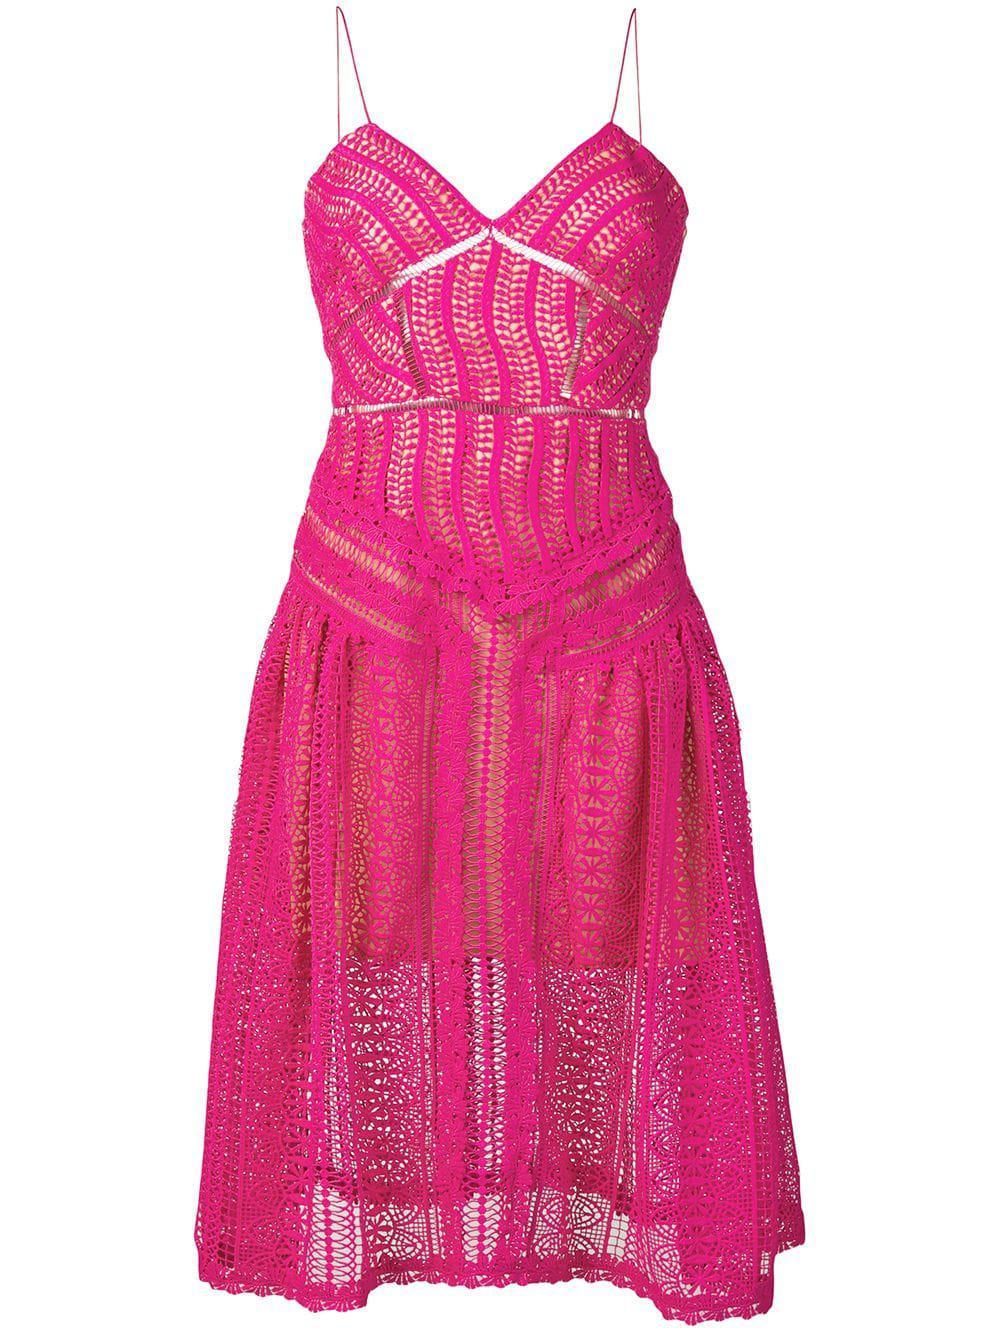 ff4a695b33c4 Lyst - Self-Portrait Lace Short Dress in Purple